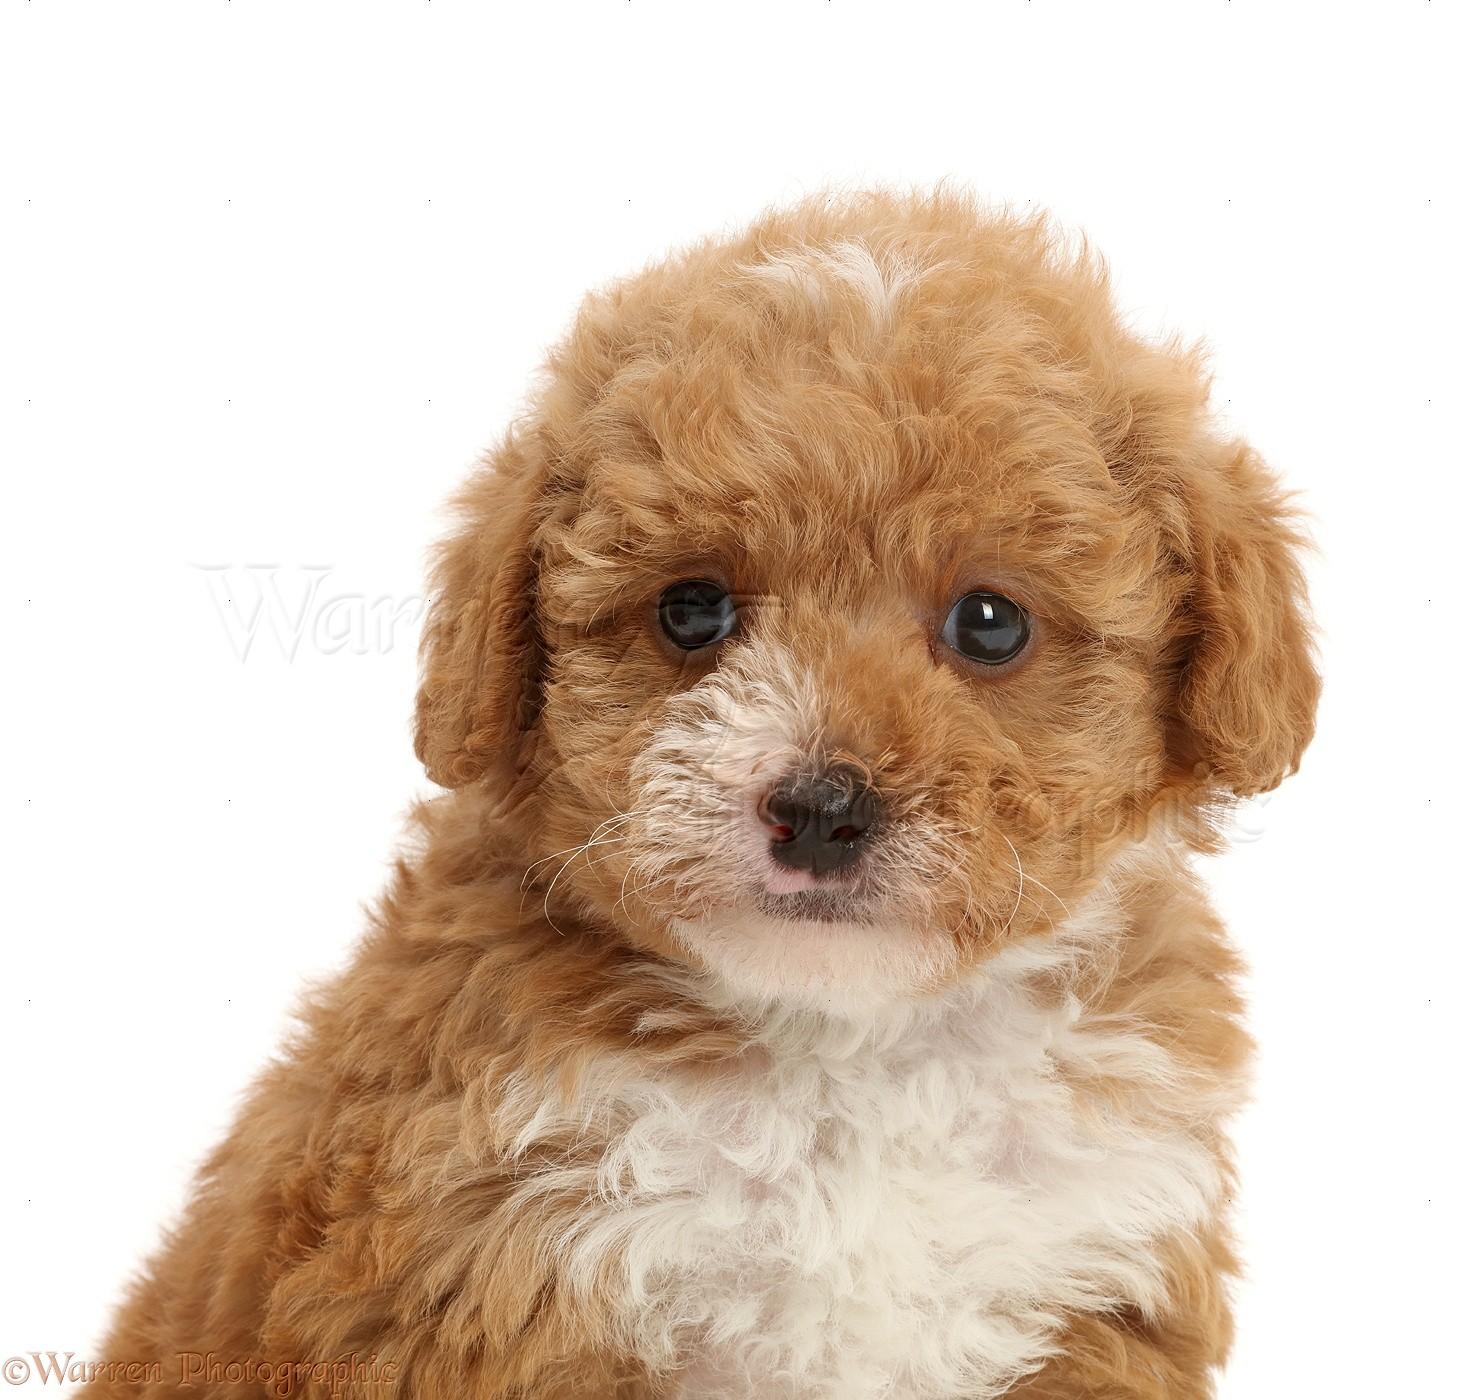 Dog F1b Toy Goldendoodle Puppy Photo Wp47731